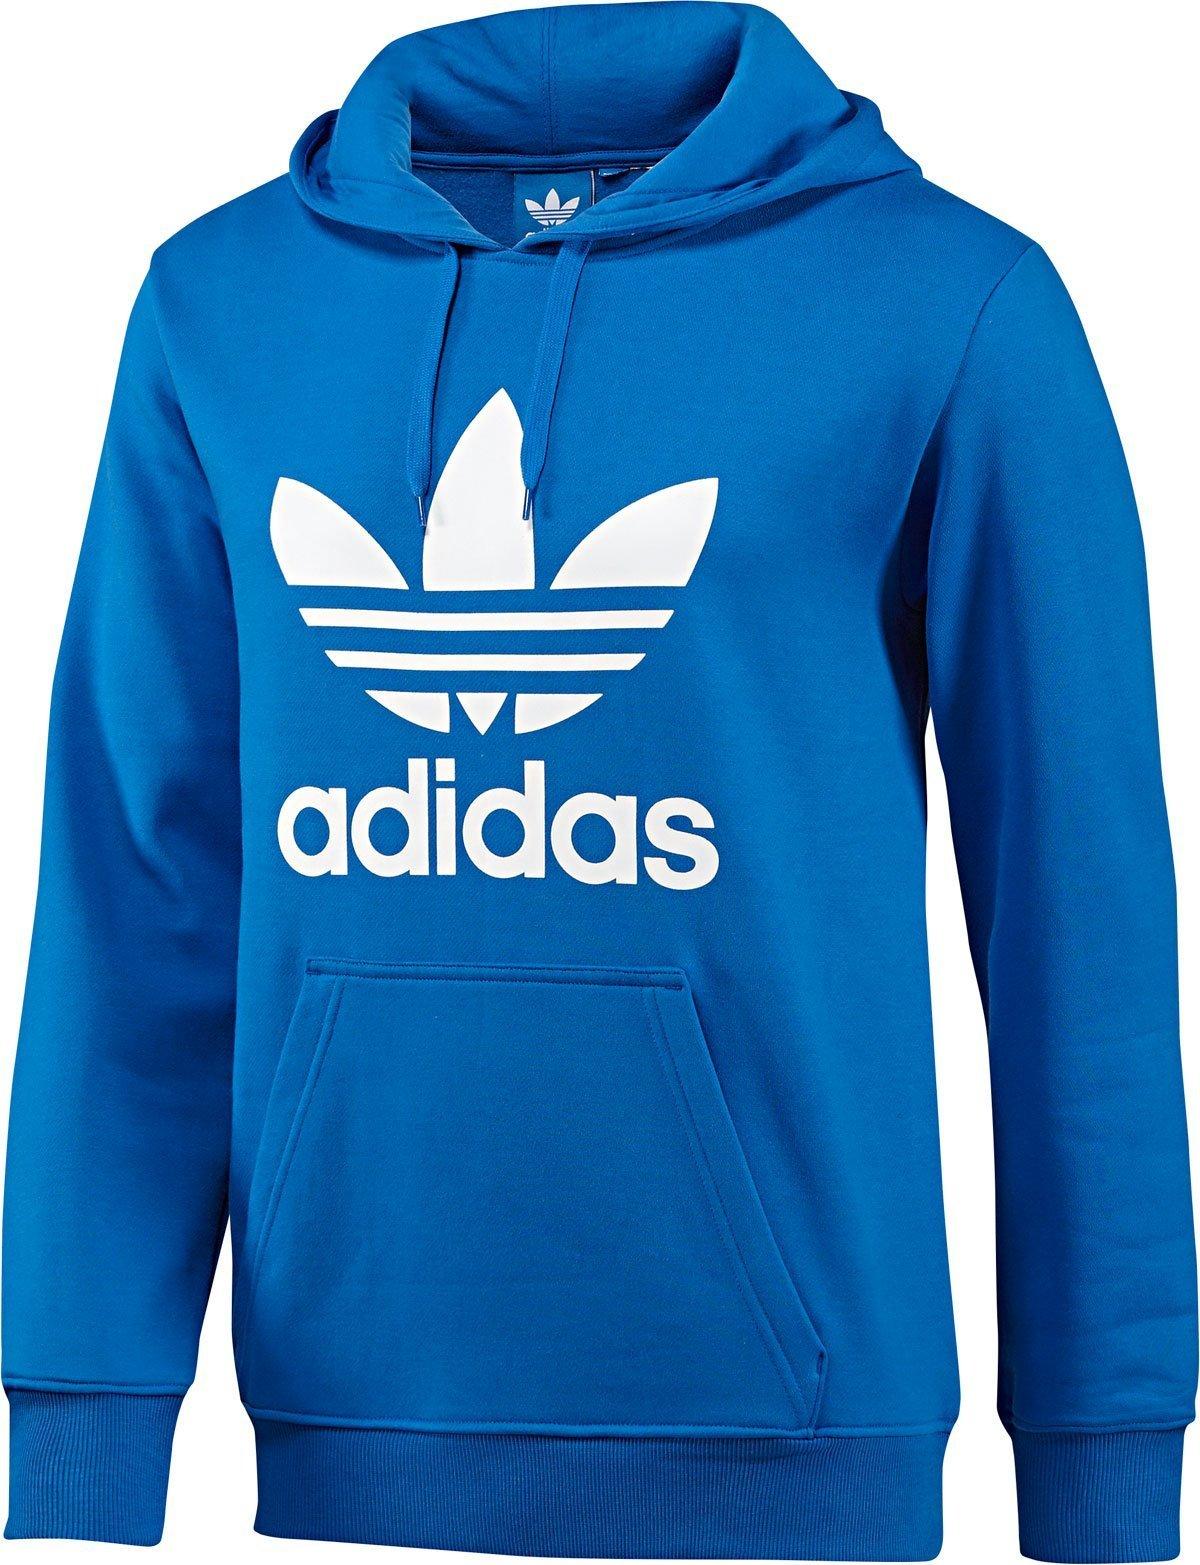 Adidas originals – Adidas adi trefoil hoodie herre fra billigsport24